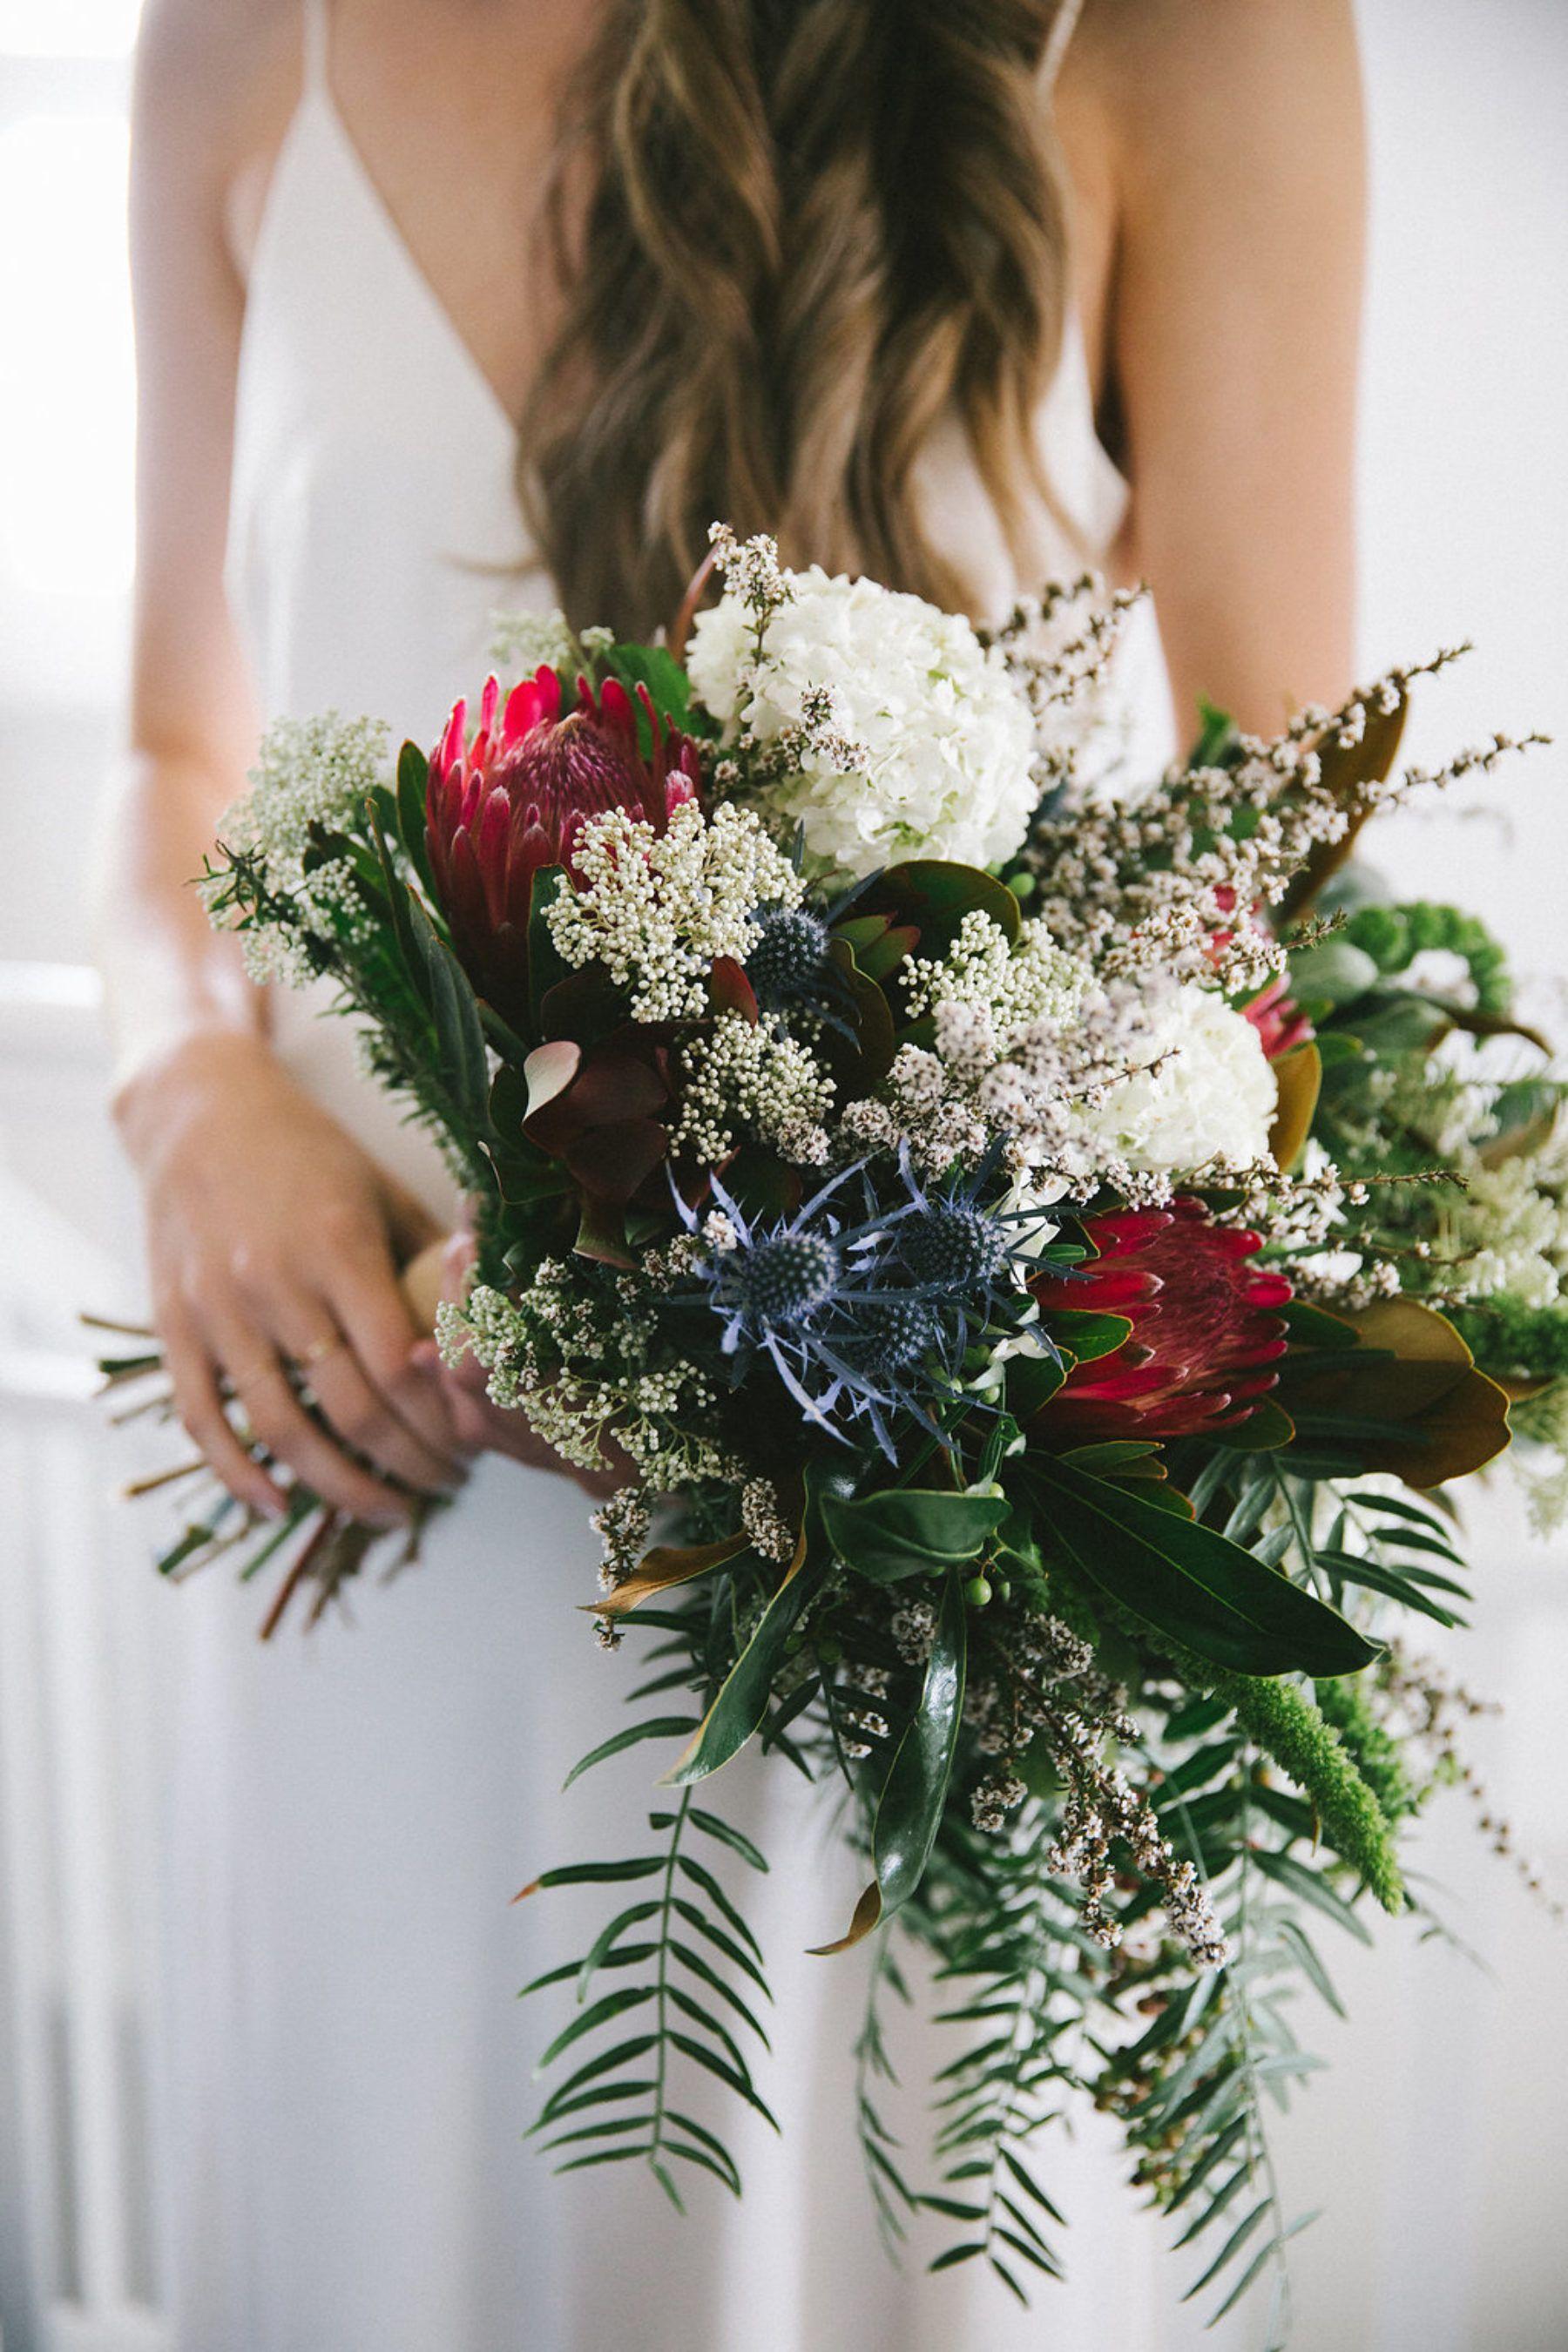 Monique & Benjamin's Modern DIY Wedding weddings